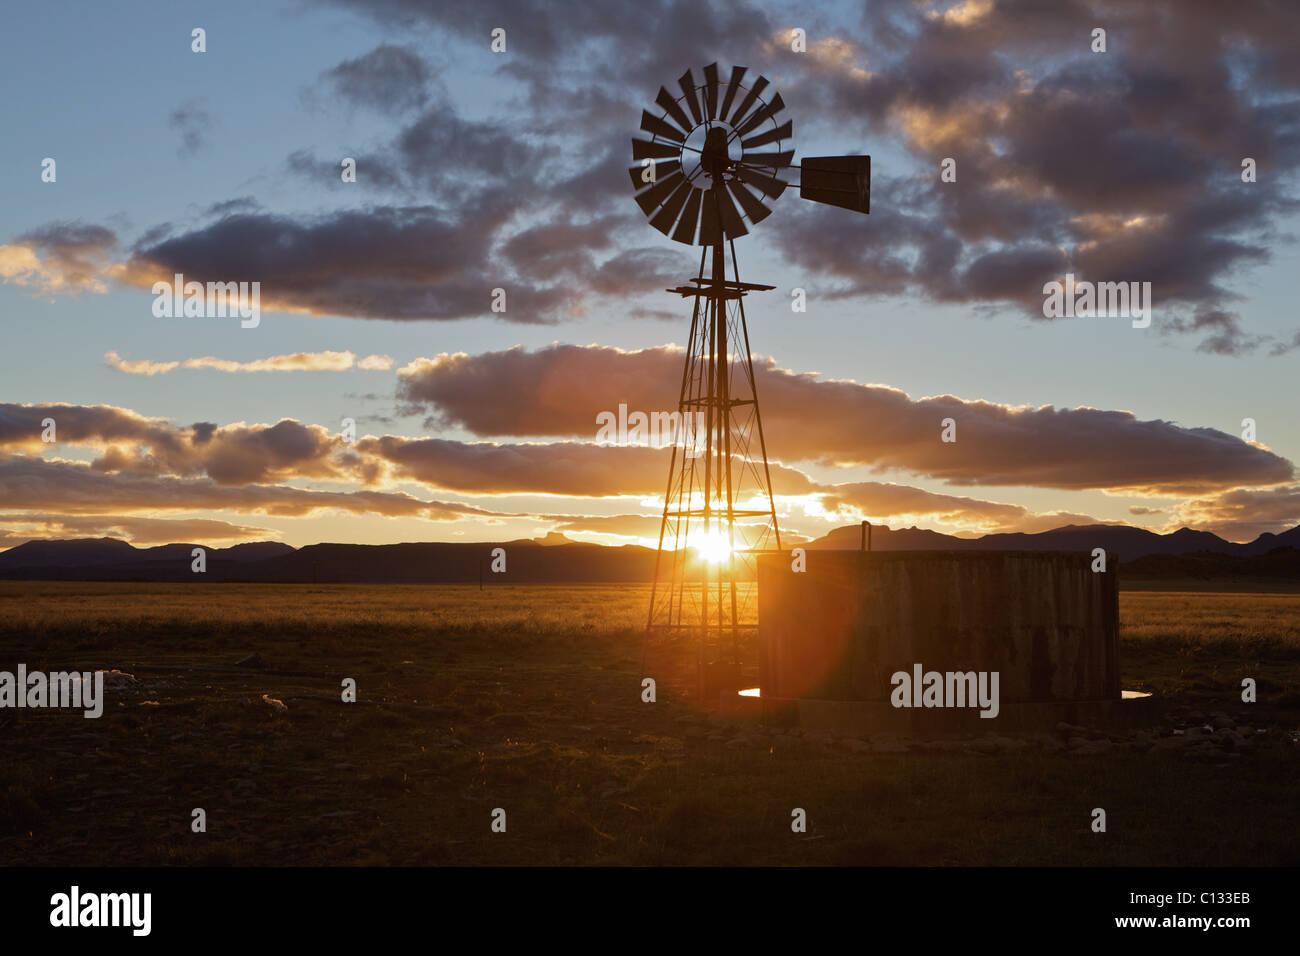 Horizontal Landscape Conway Stock Photos & Horizontal Landscape ...